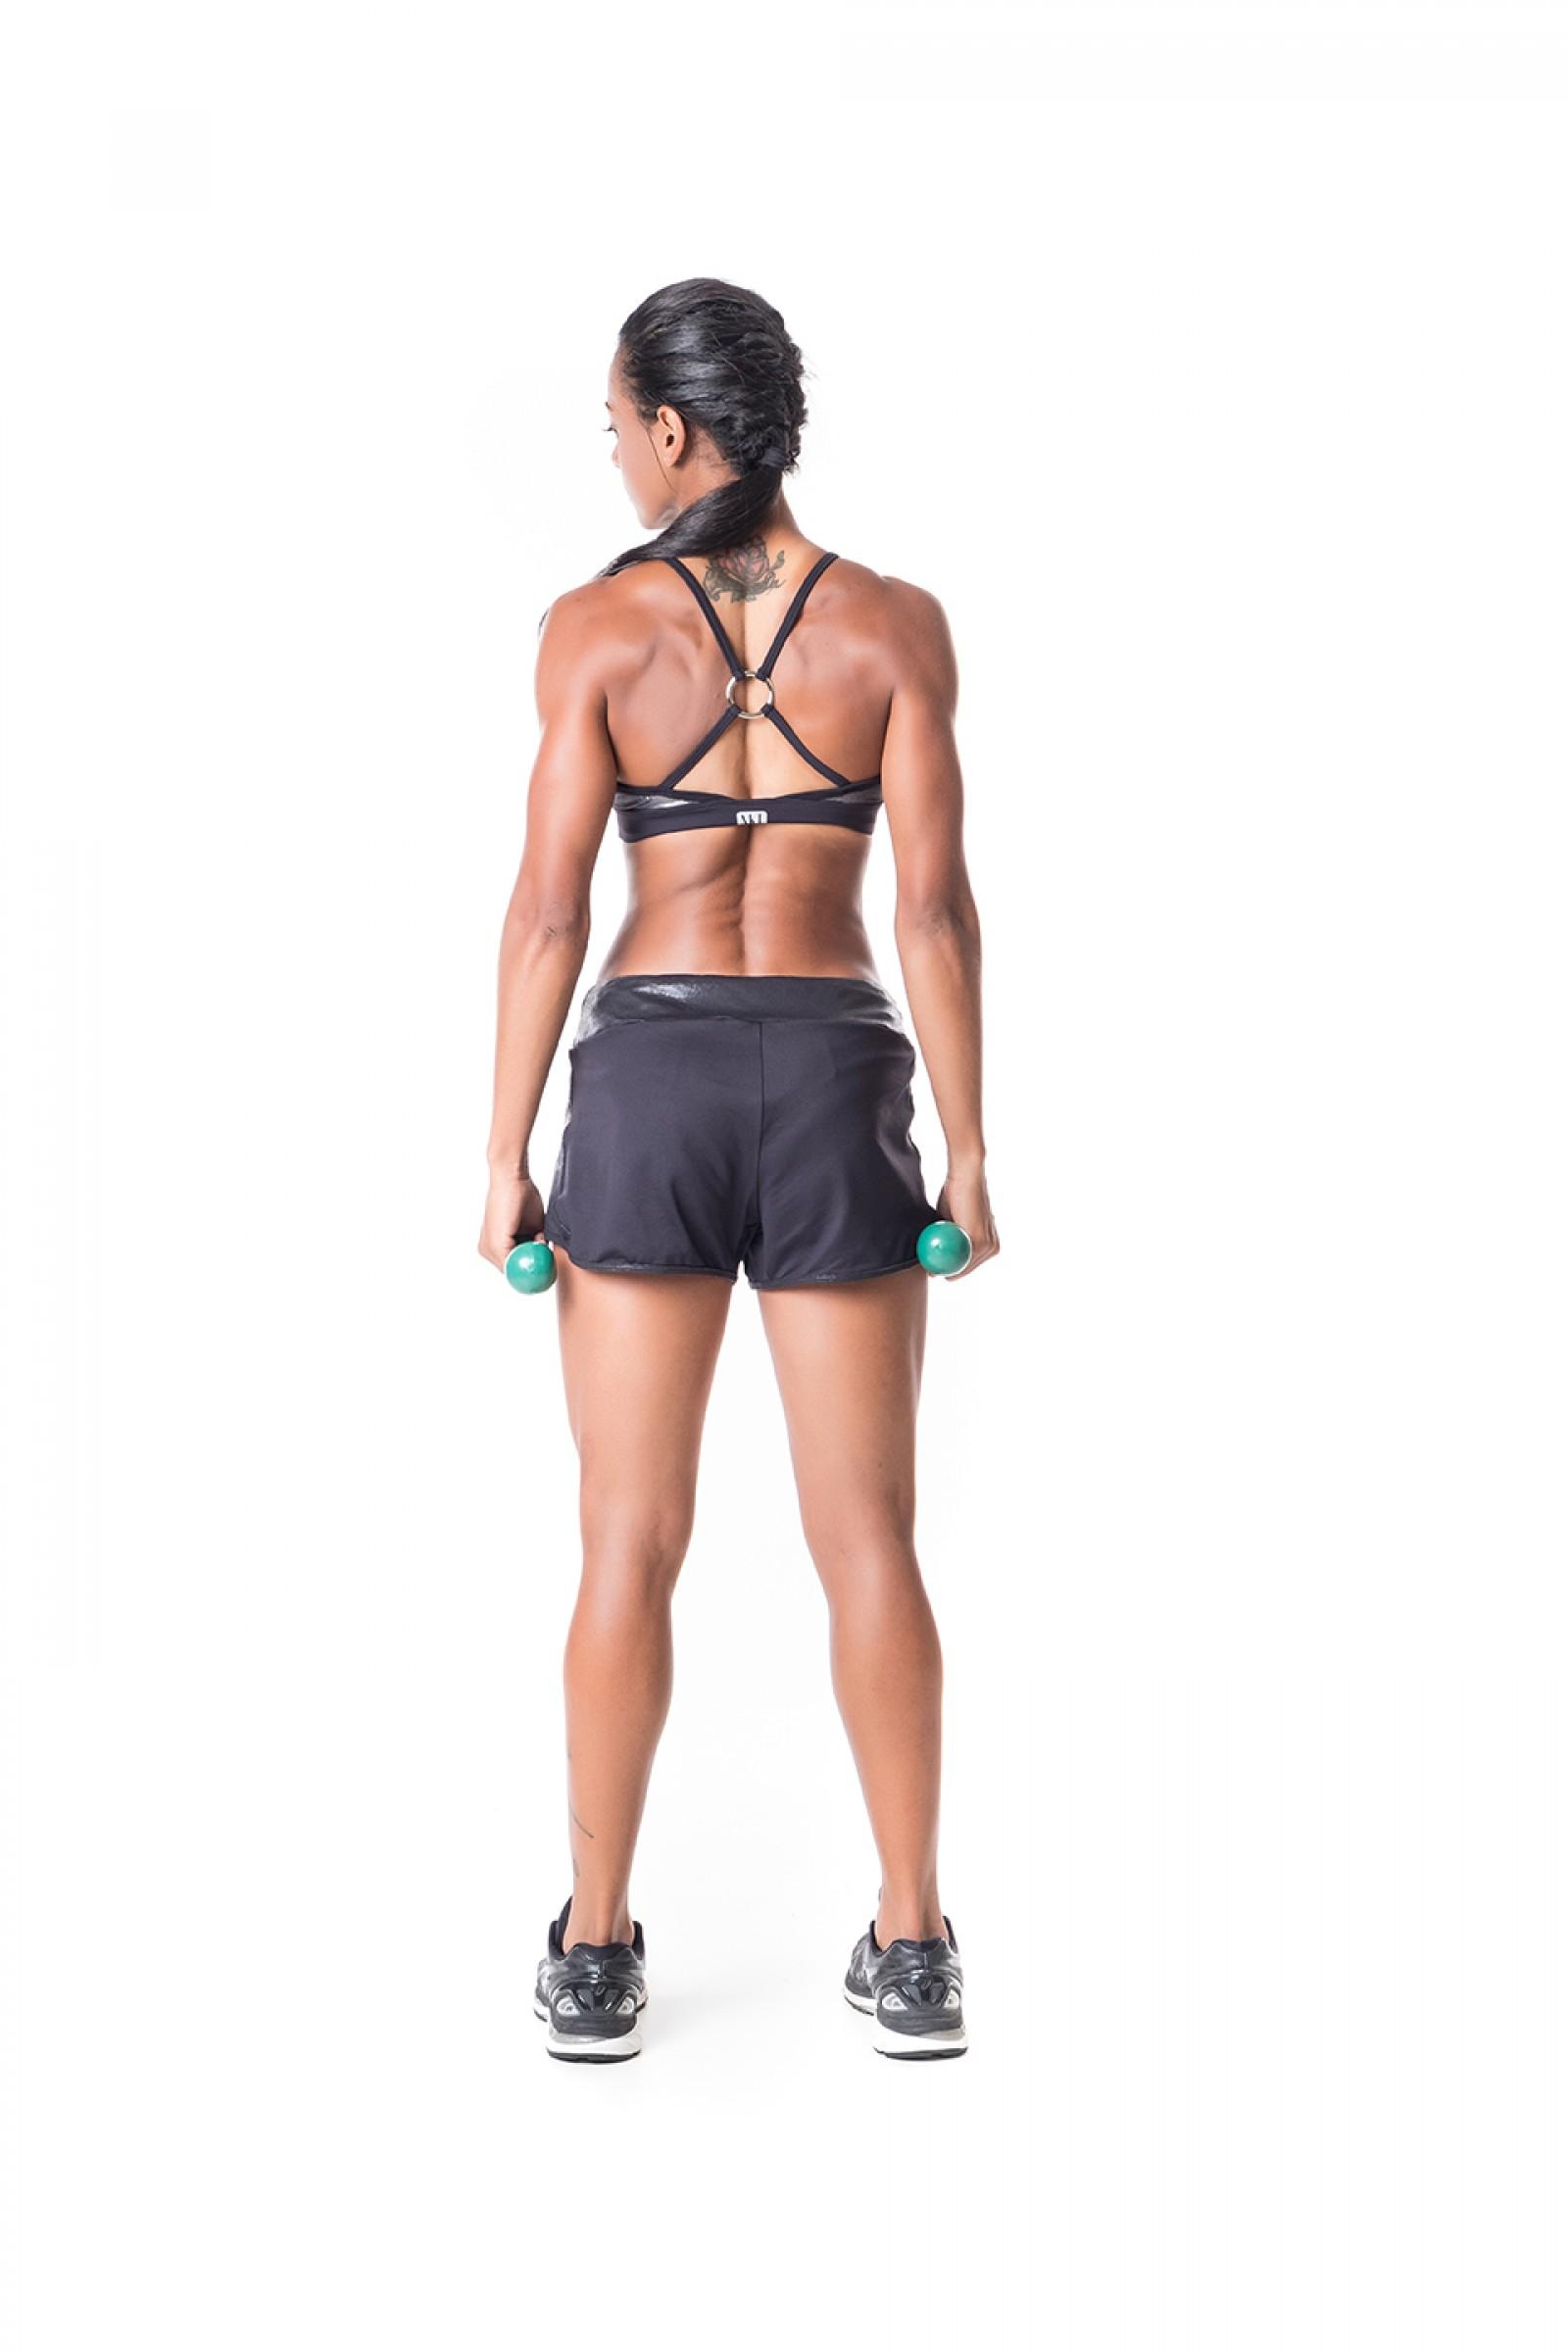 Top Infinity Prata, Coleção Challenge - NKT Fitwear Moda Fitness